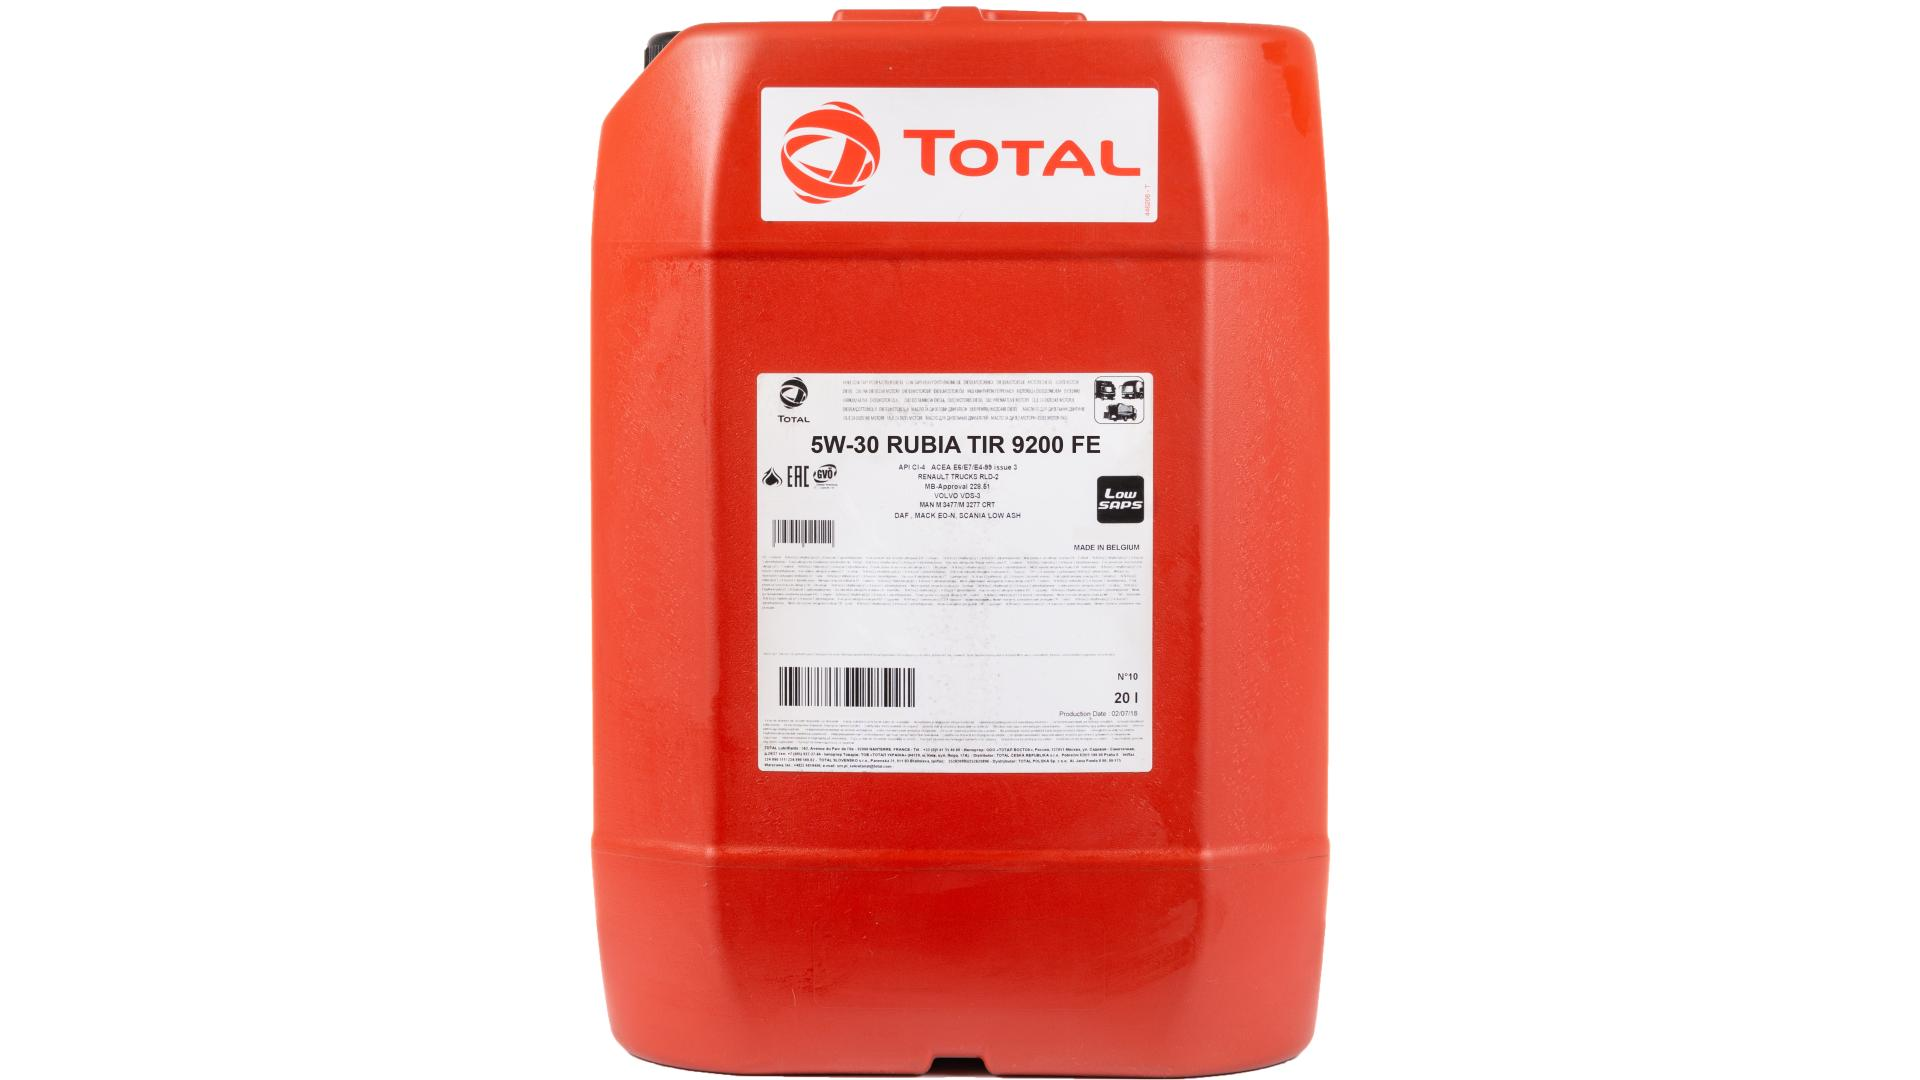 Total 5w-30 RubiaTir9200 FE 20L (126429)